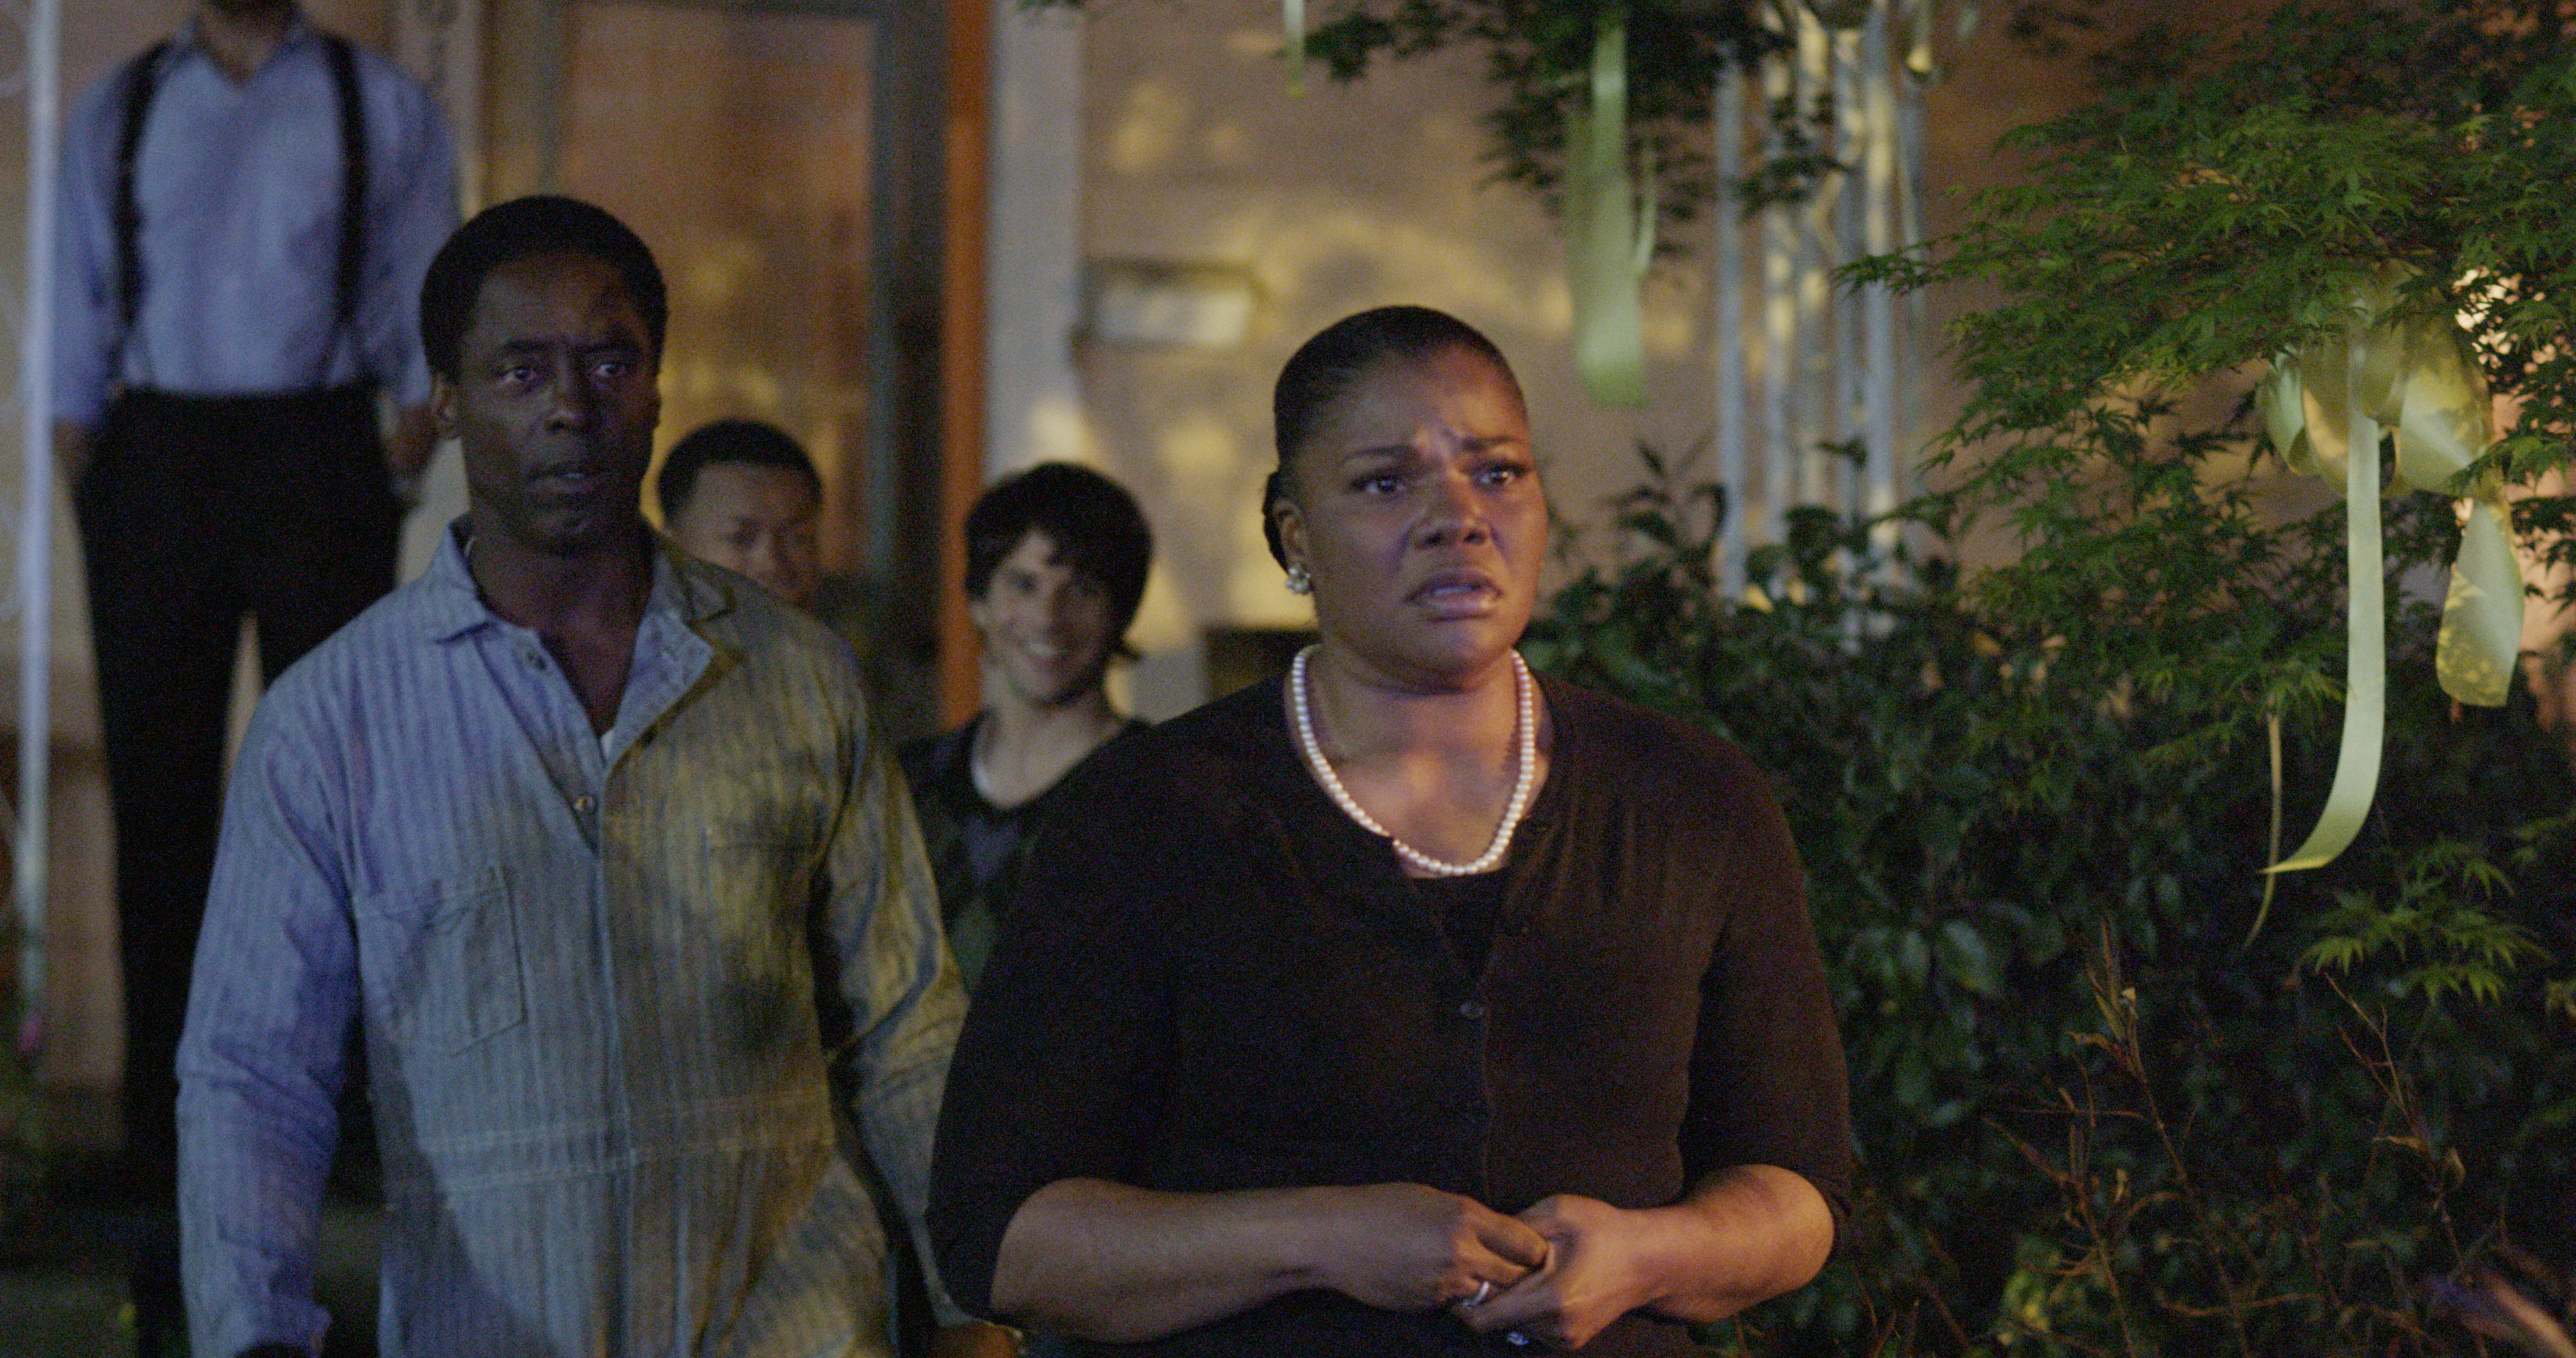 gay isaiah movie washington jpg 1080x810